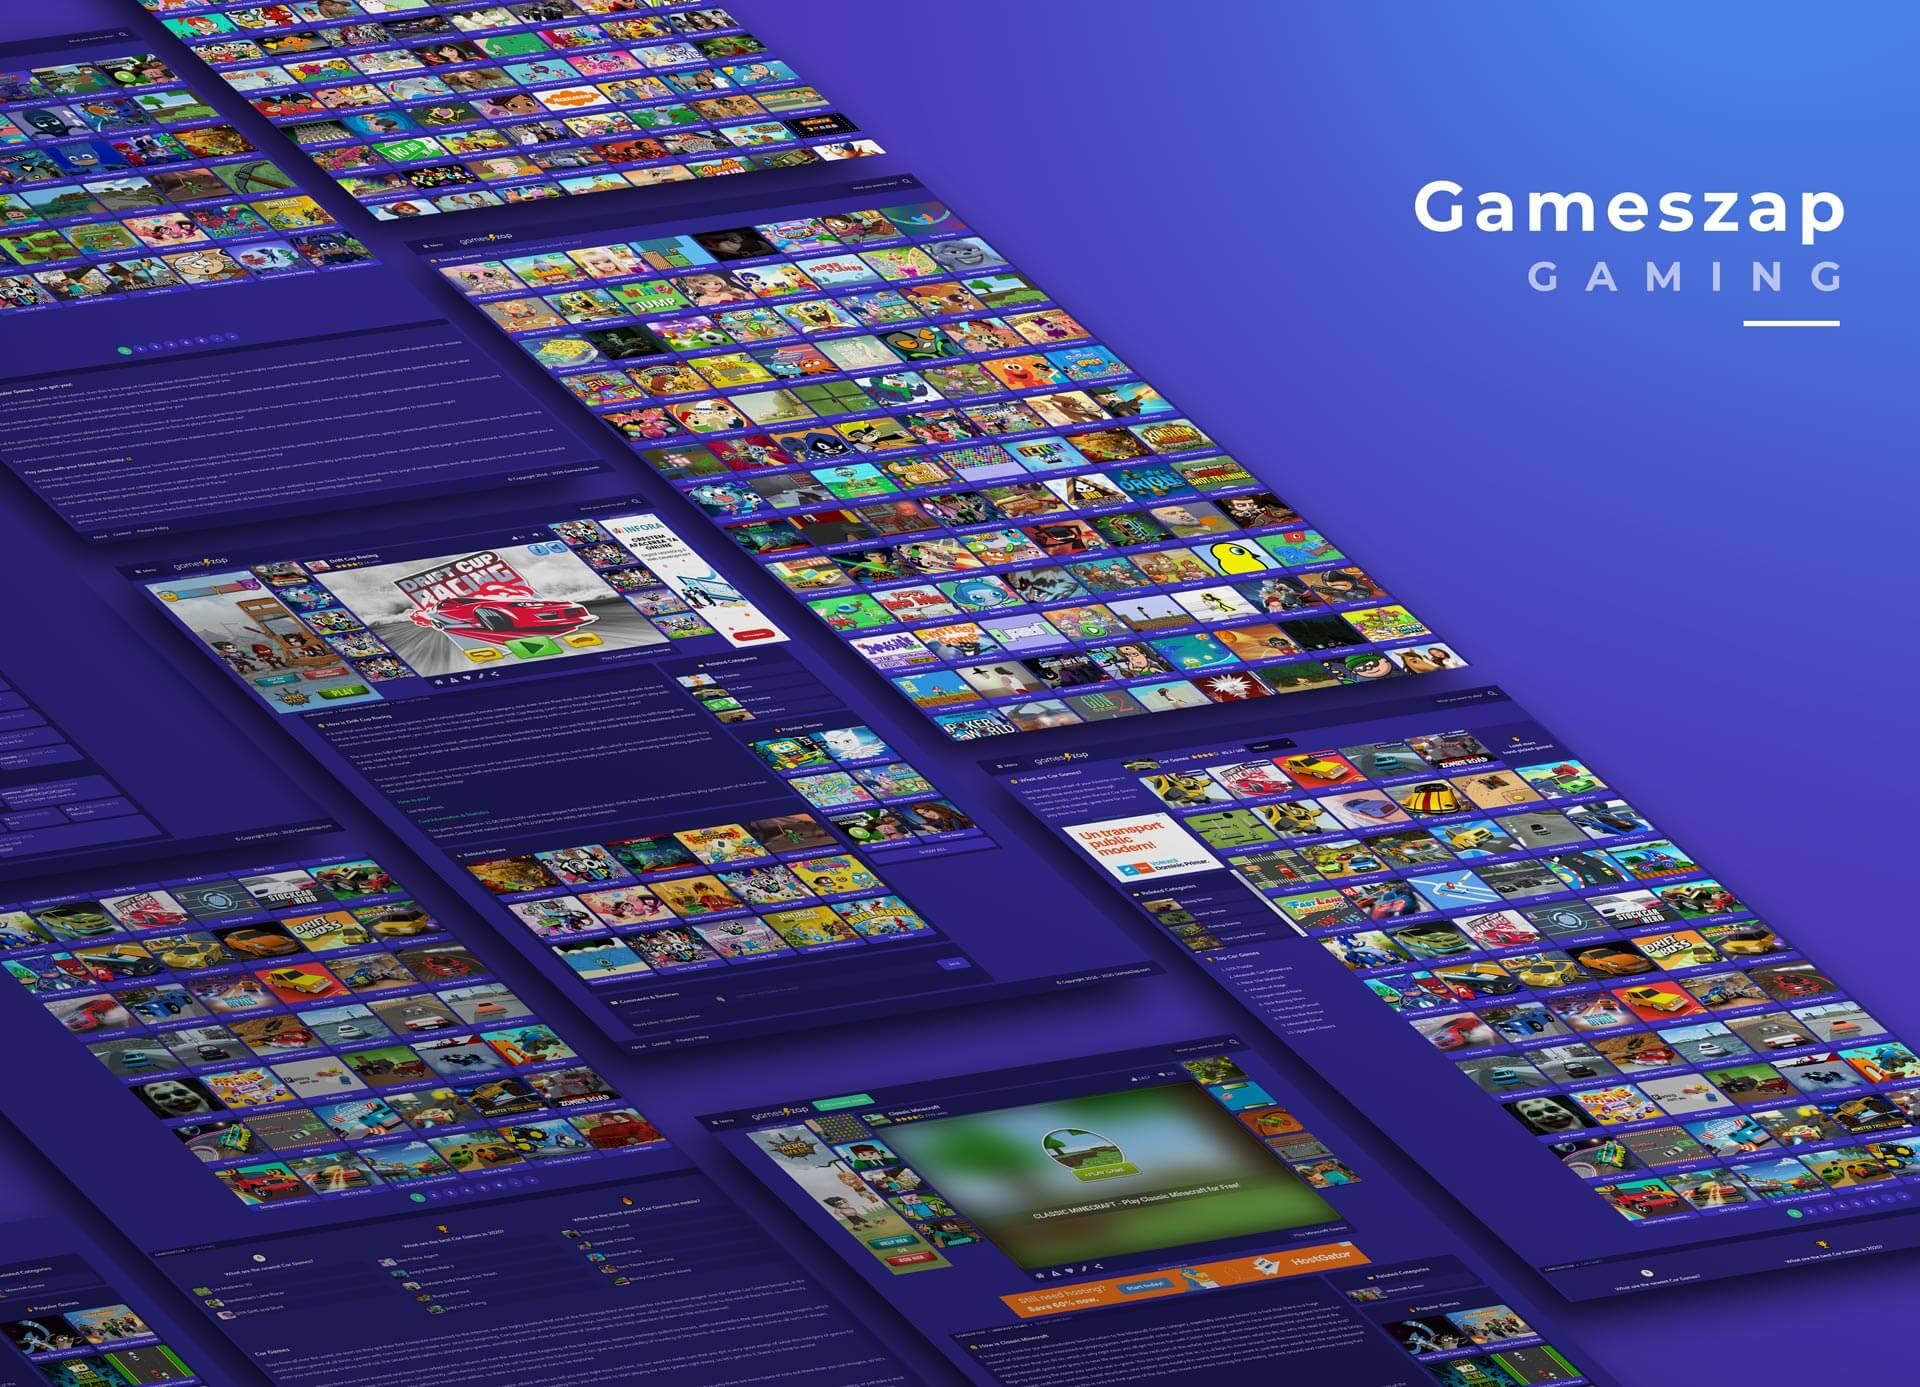 gameszap-online-gaming-site-full